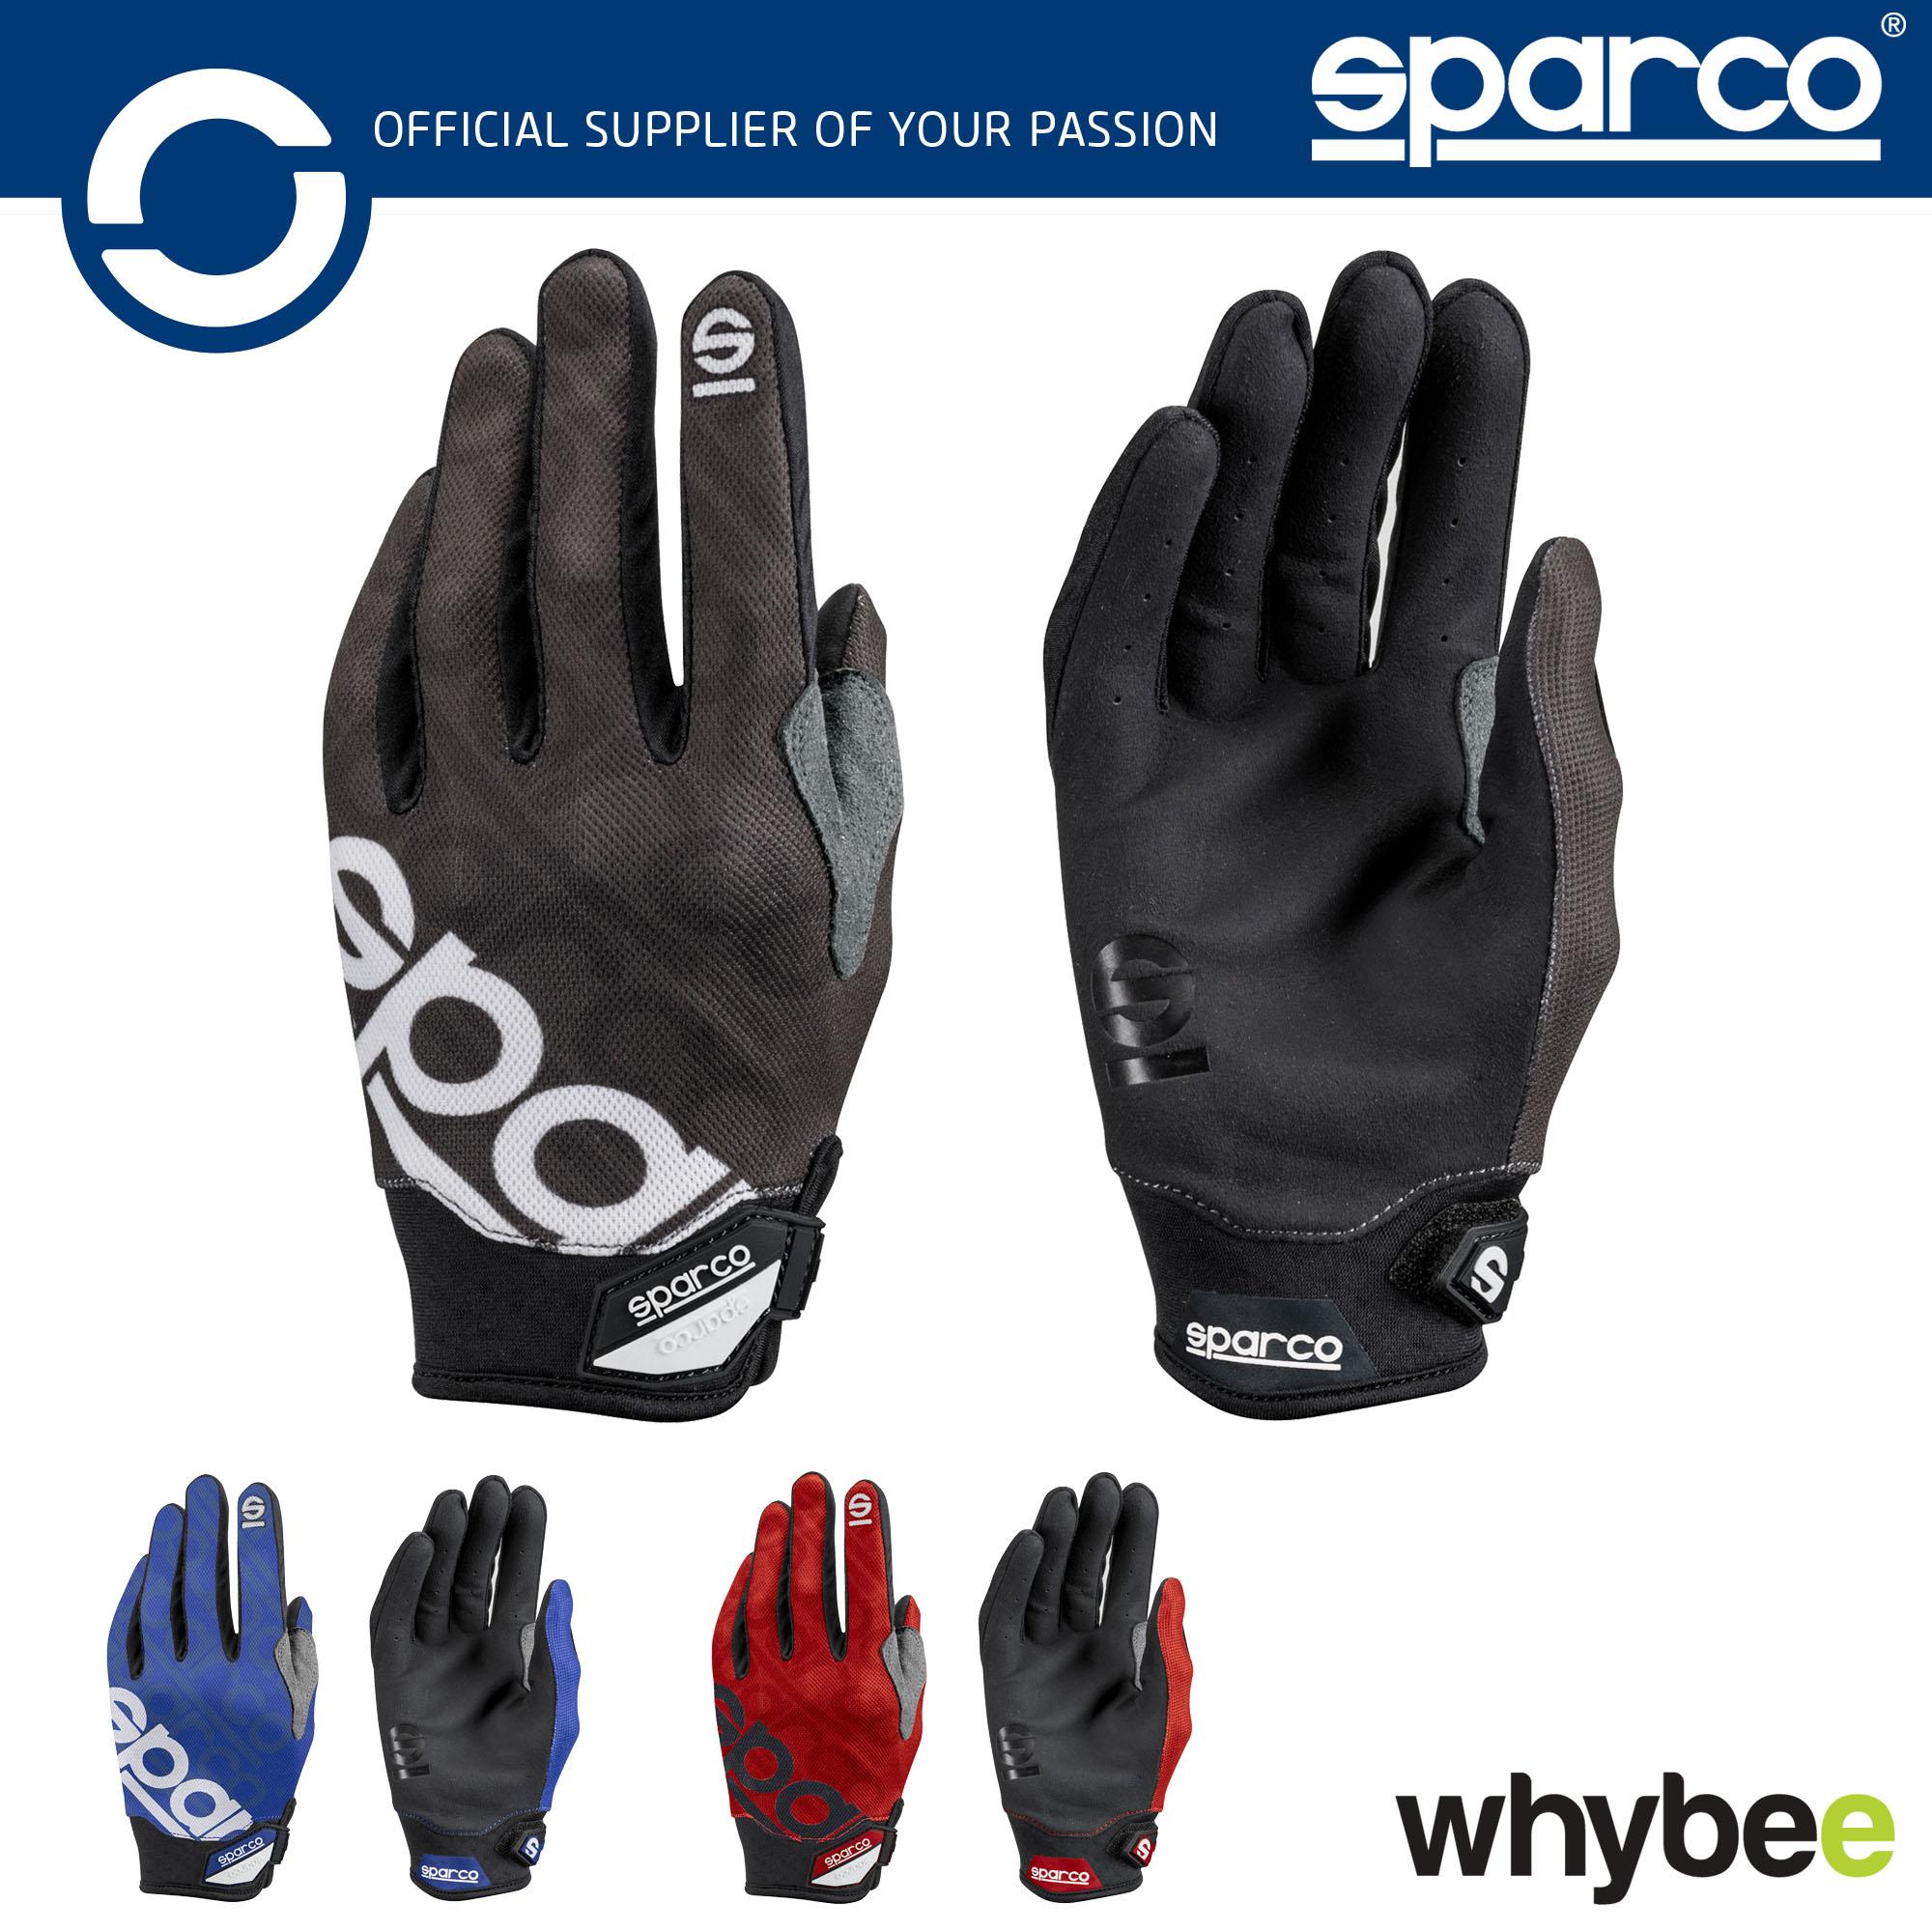 maintenance repair BLACK SPARCO mechanics gloves MECA-3 precision work